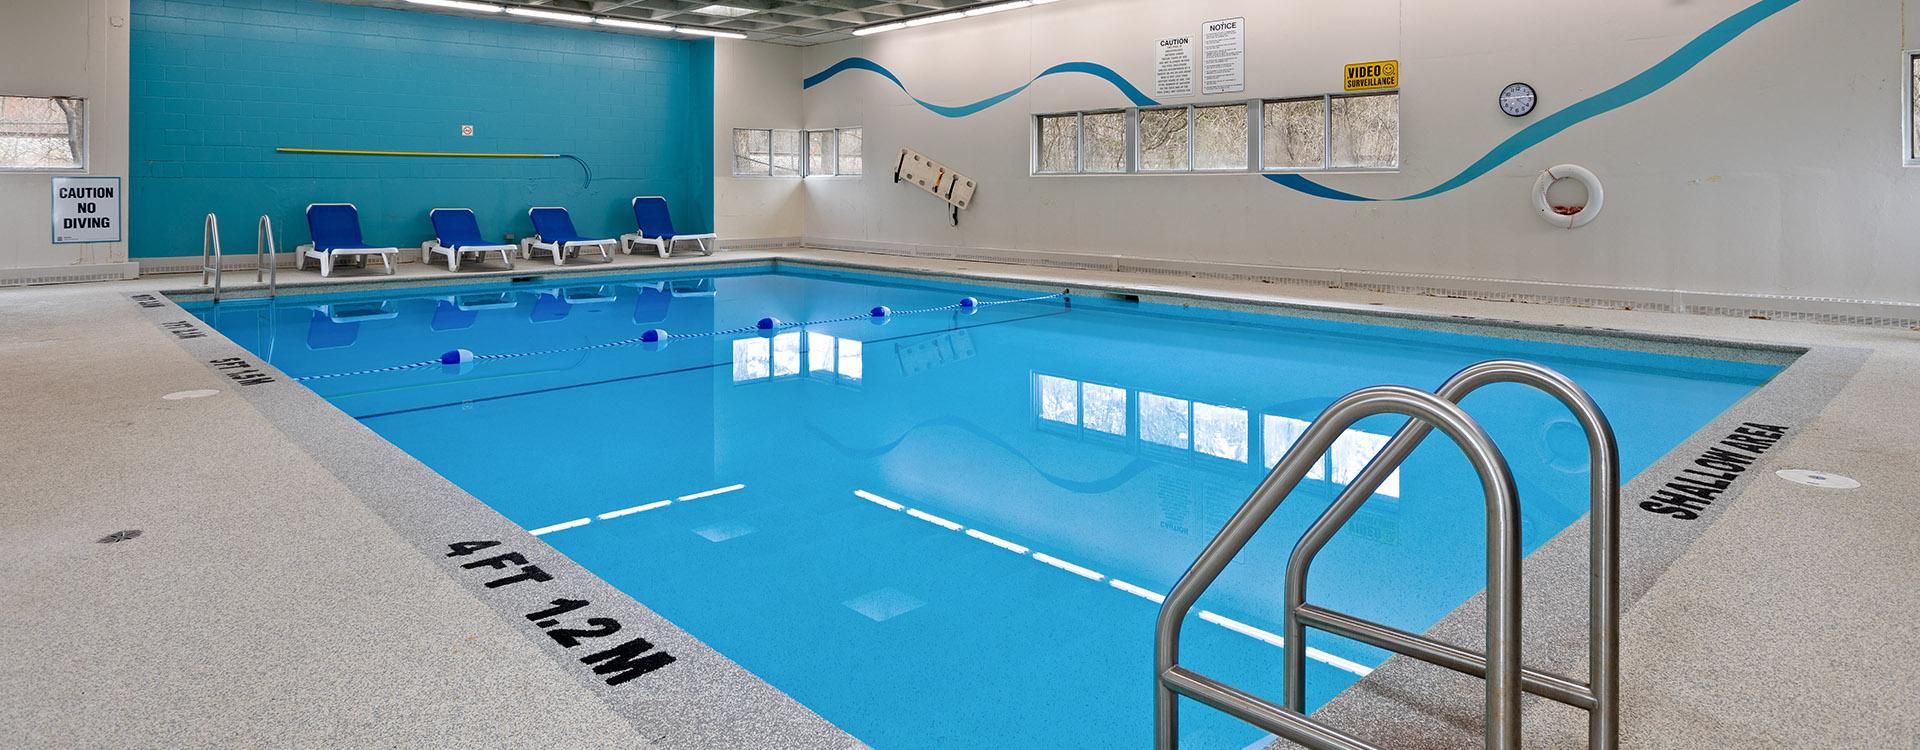 castleview-1755-frobisher-lane-ottawa-pool